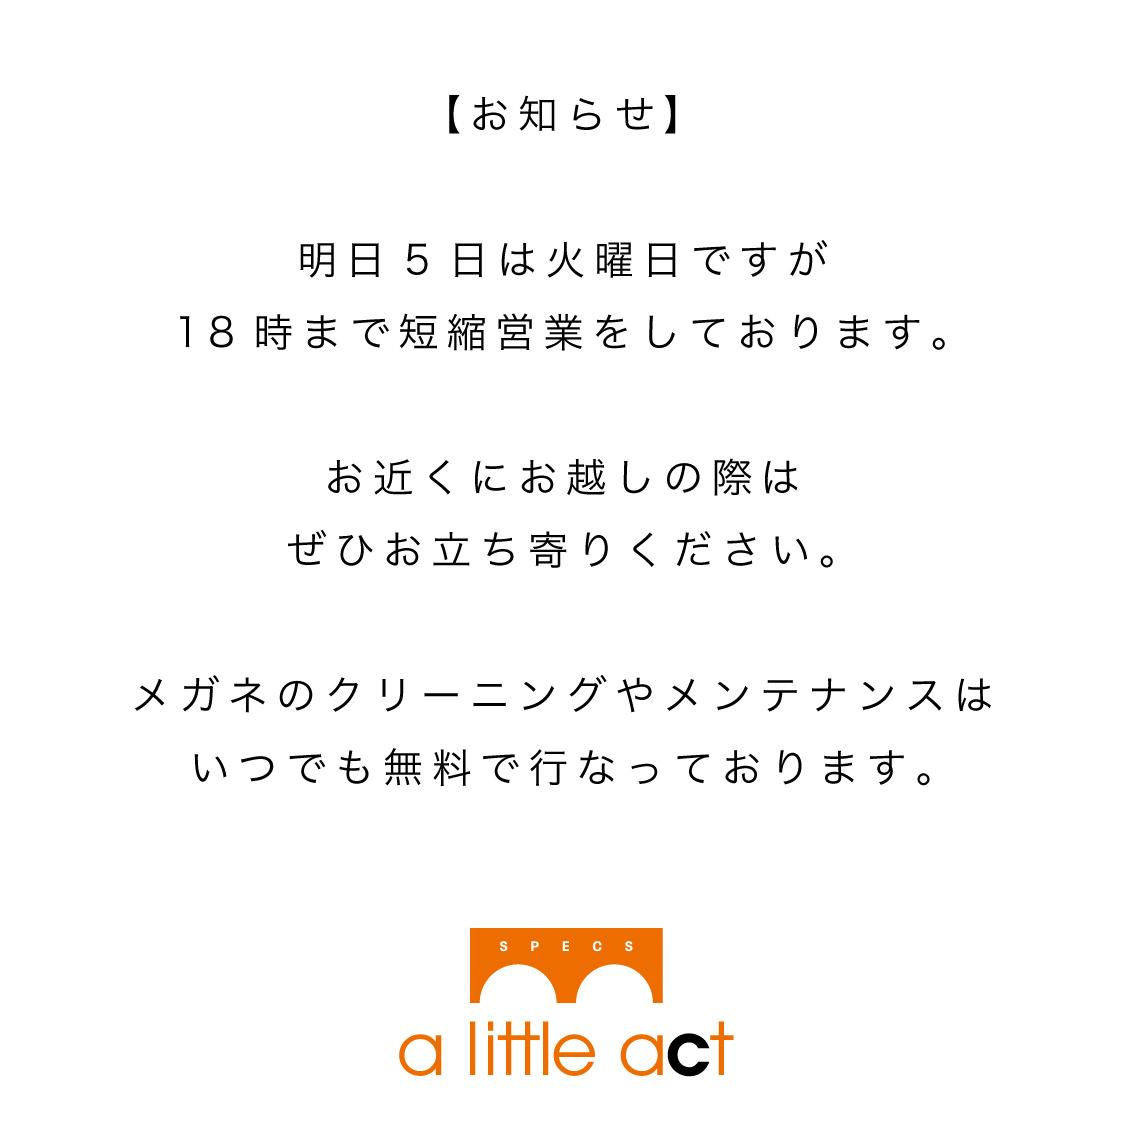 f:id:alittleact:20210104172211j:plain